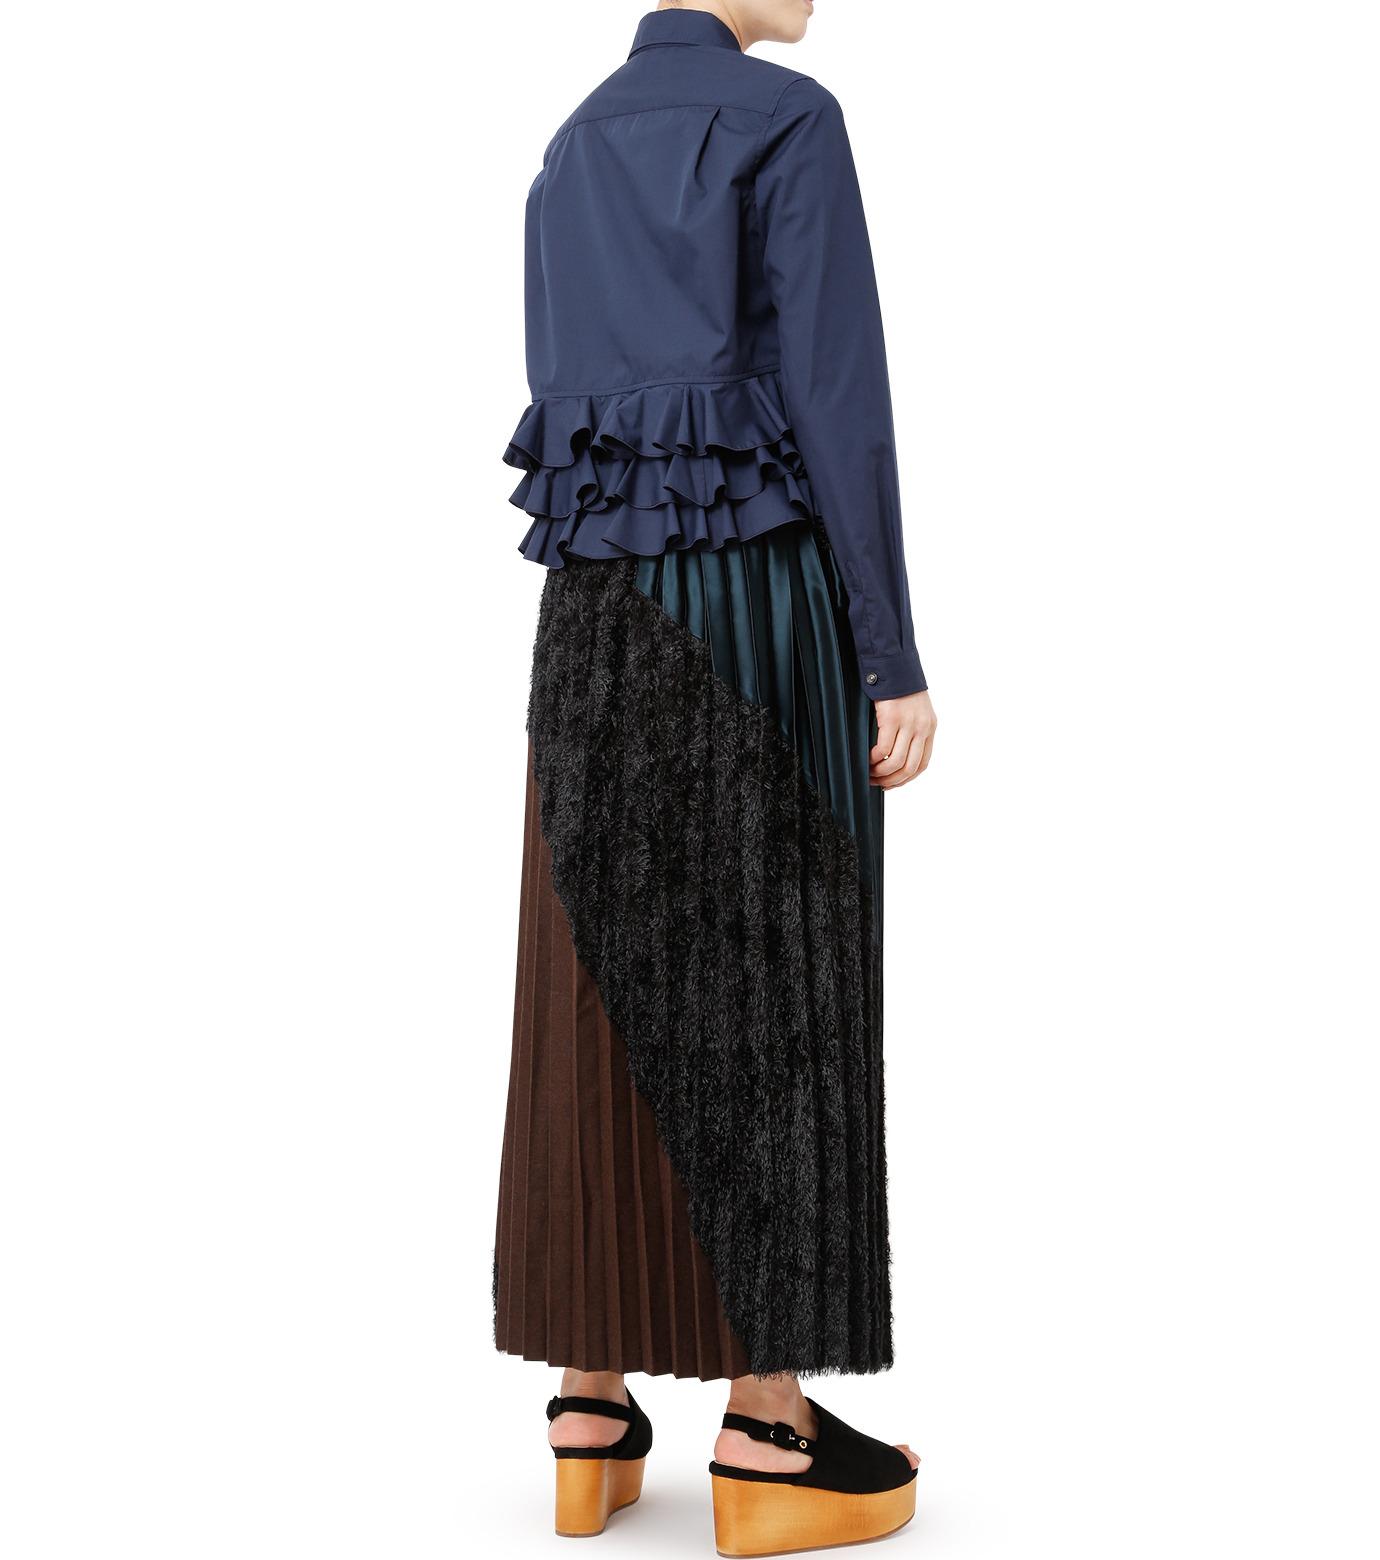 KOLOR(カラー)のShirt w/Back Ruffle Detail-NAVY(シャツ/shirt)-16WCL-B02134-93 拡大詳細画像4